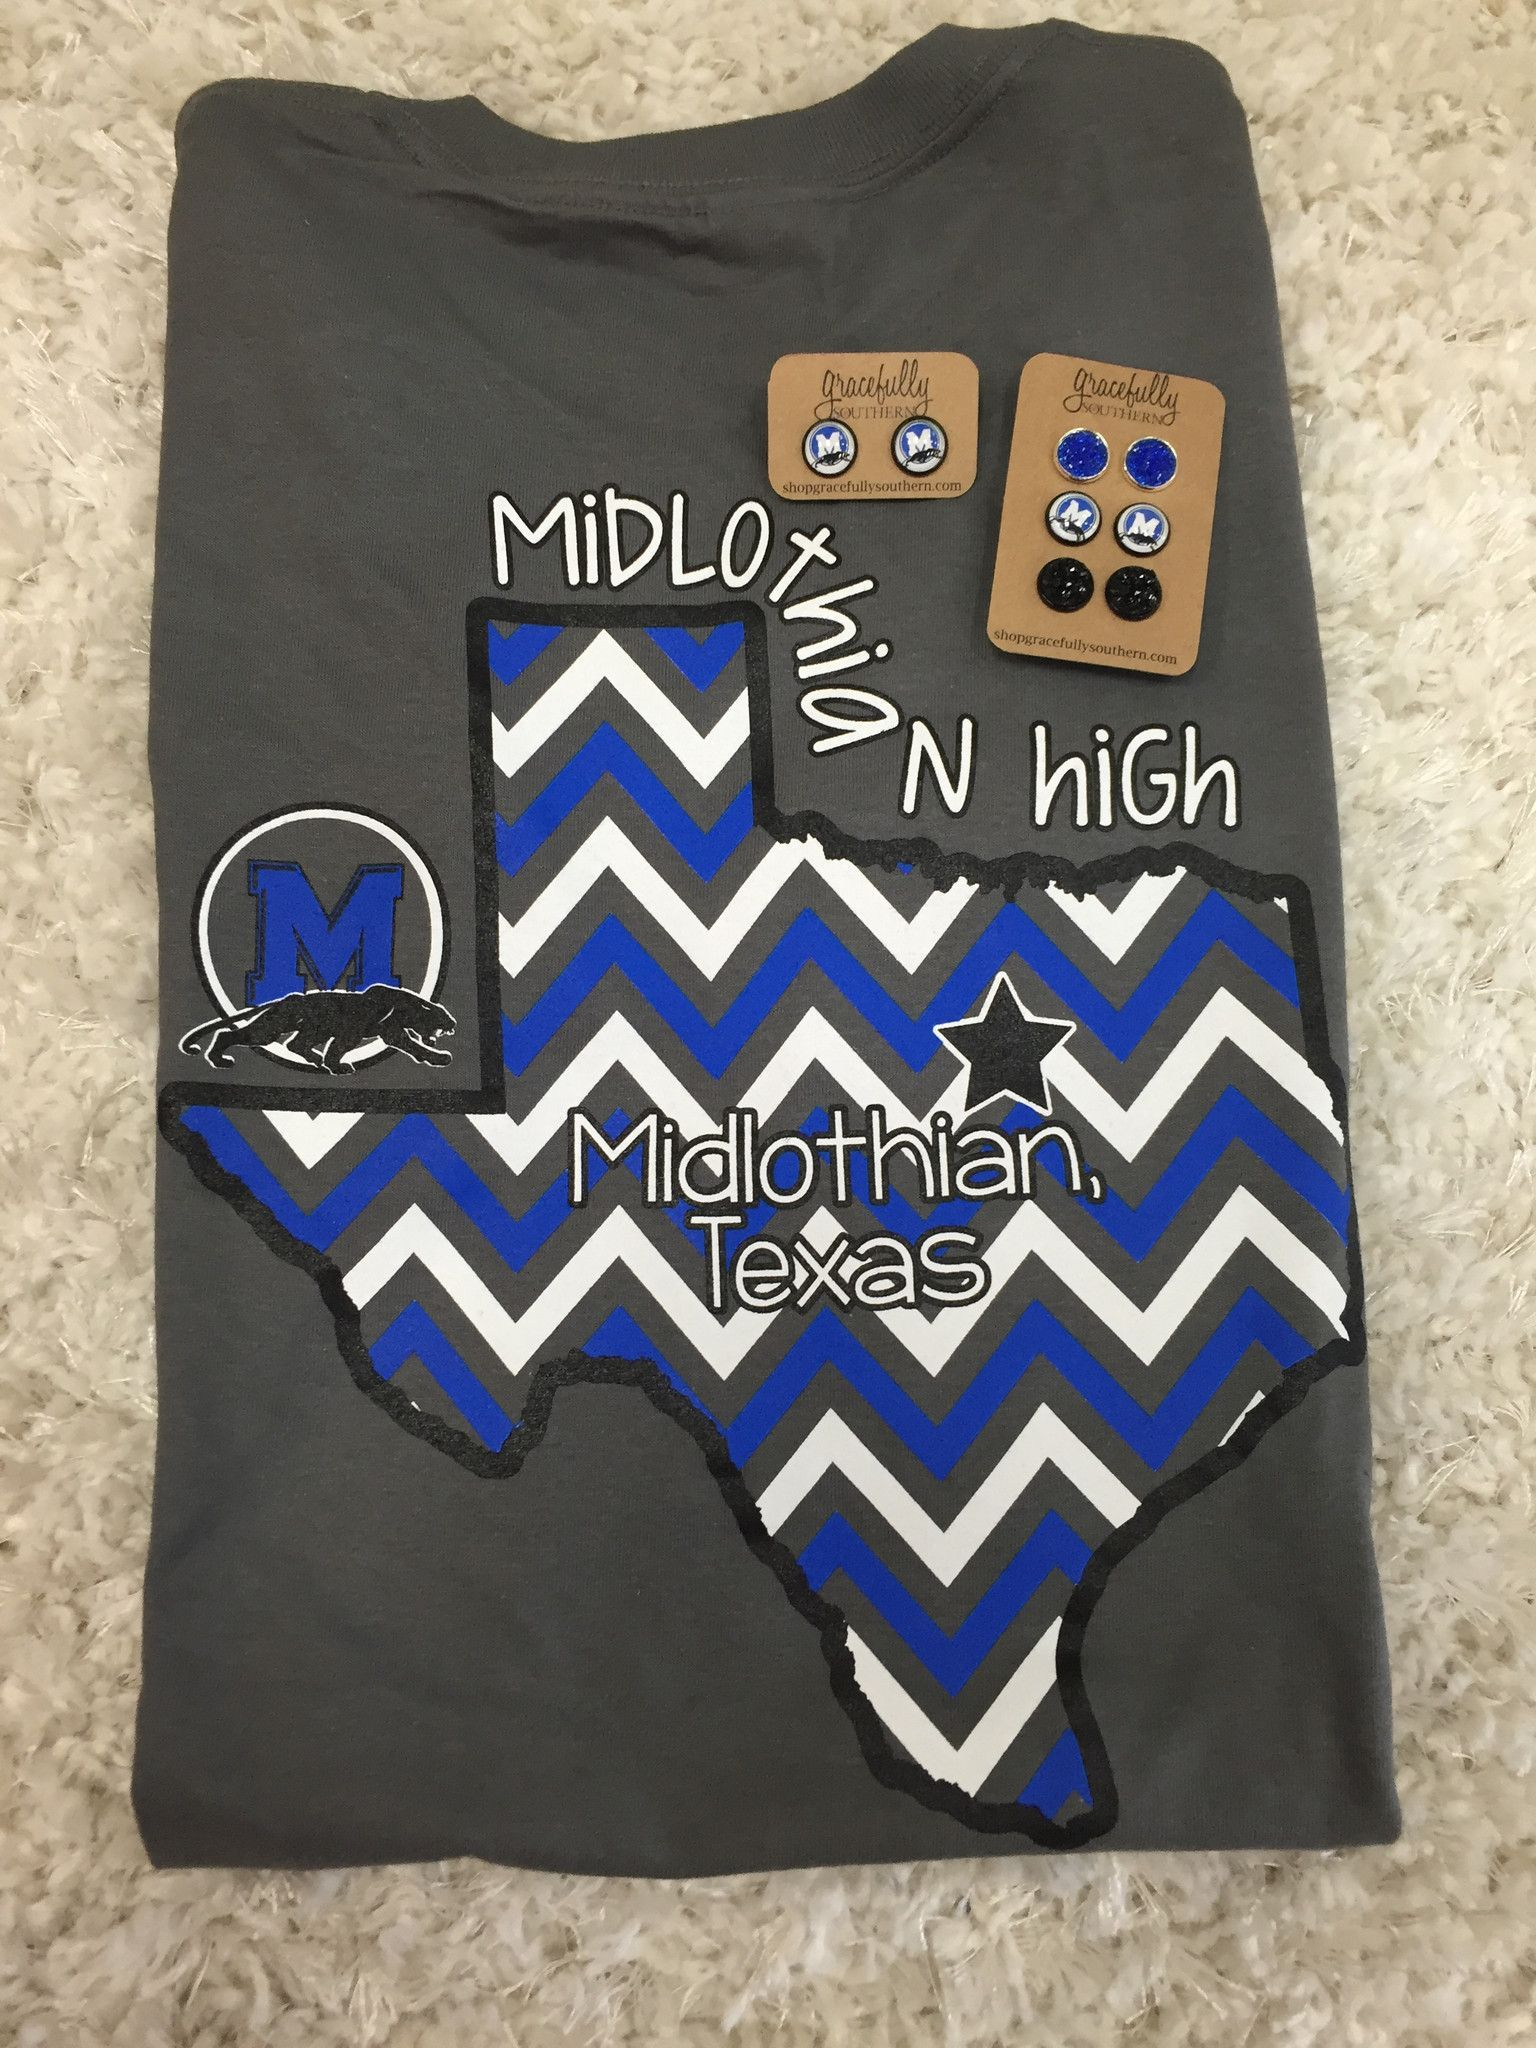 Midlothian high school tshirts school spirit shirts